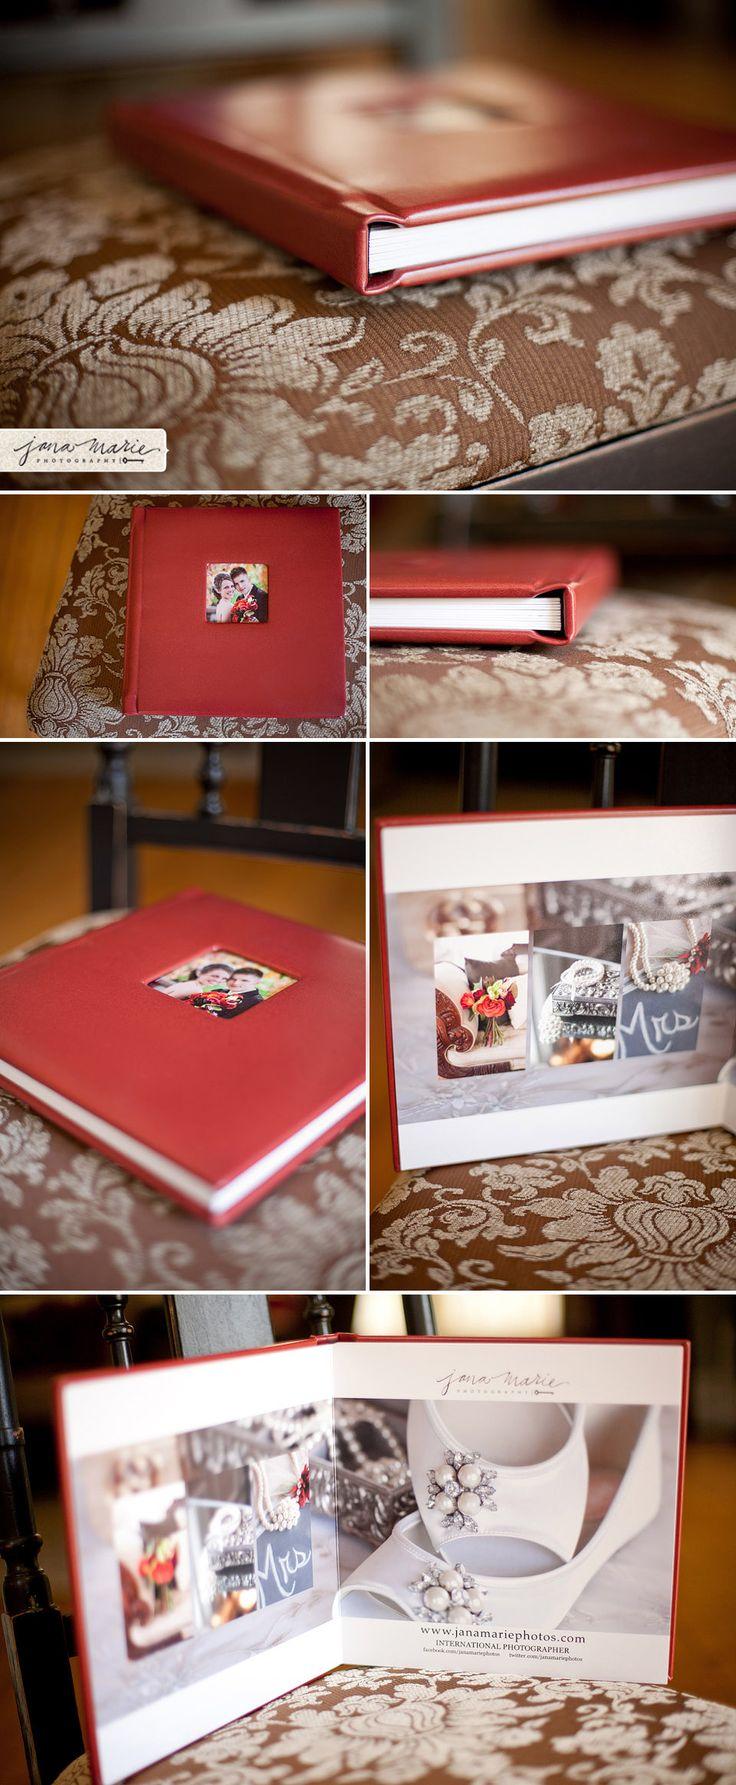 Renaissance Albums - 10x10 SoHo Book  |  Madison NL - Merlot Cover  |  Image Opening (OP1)  |  10 Pagespreads  |  Source: Jana Marie Photography (http://www.janamariephotos.com/2012/05/longview-mansion-album-sample-lees-summit-wedding.html)